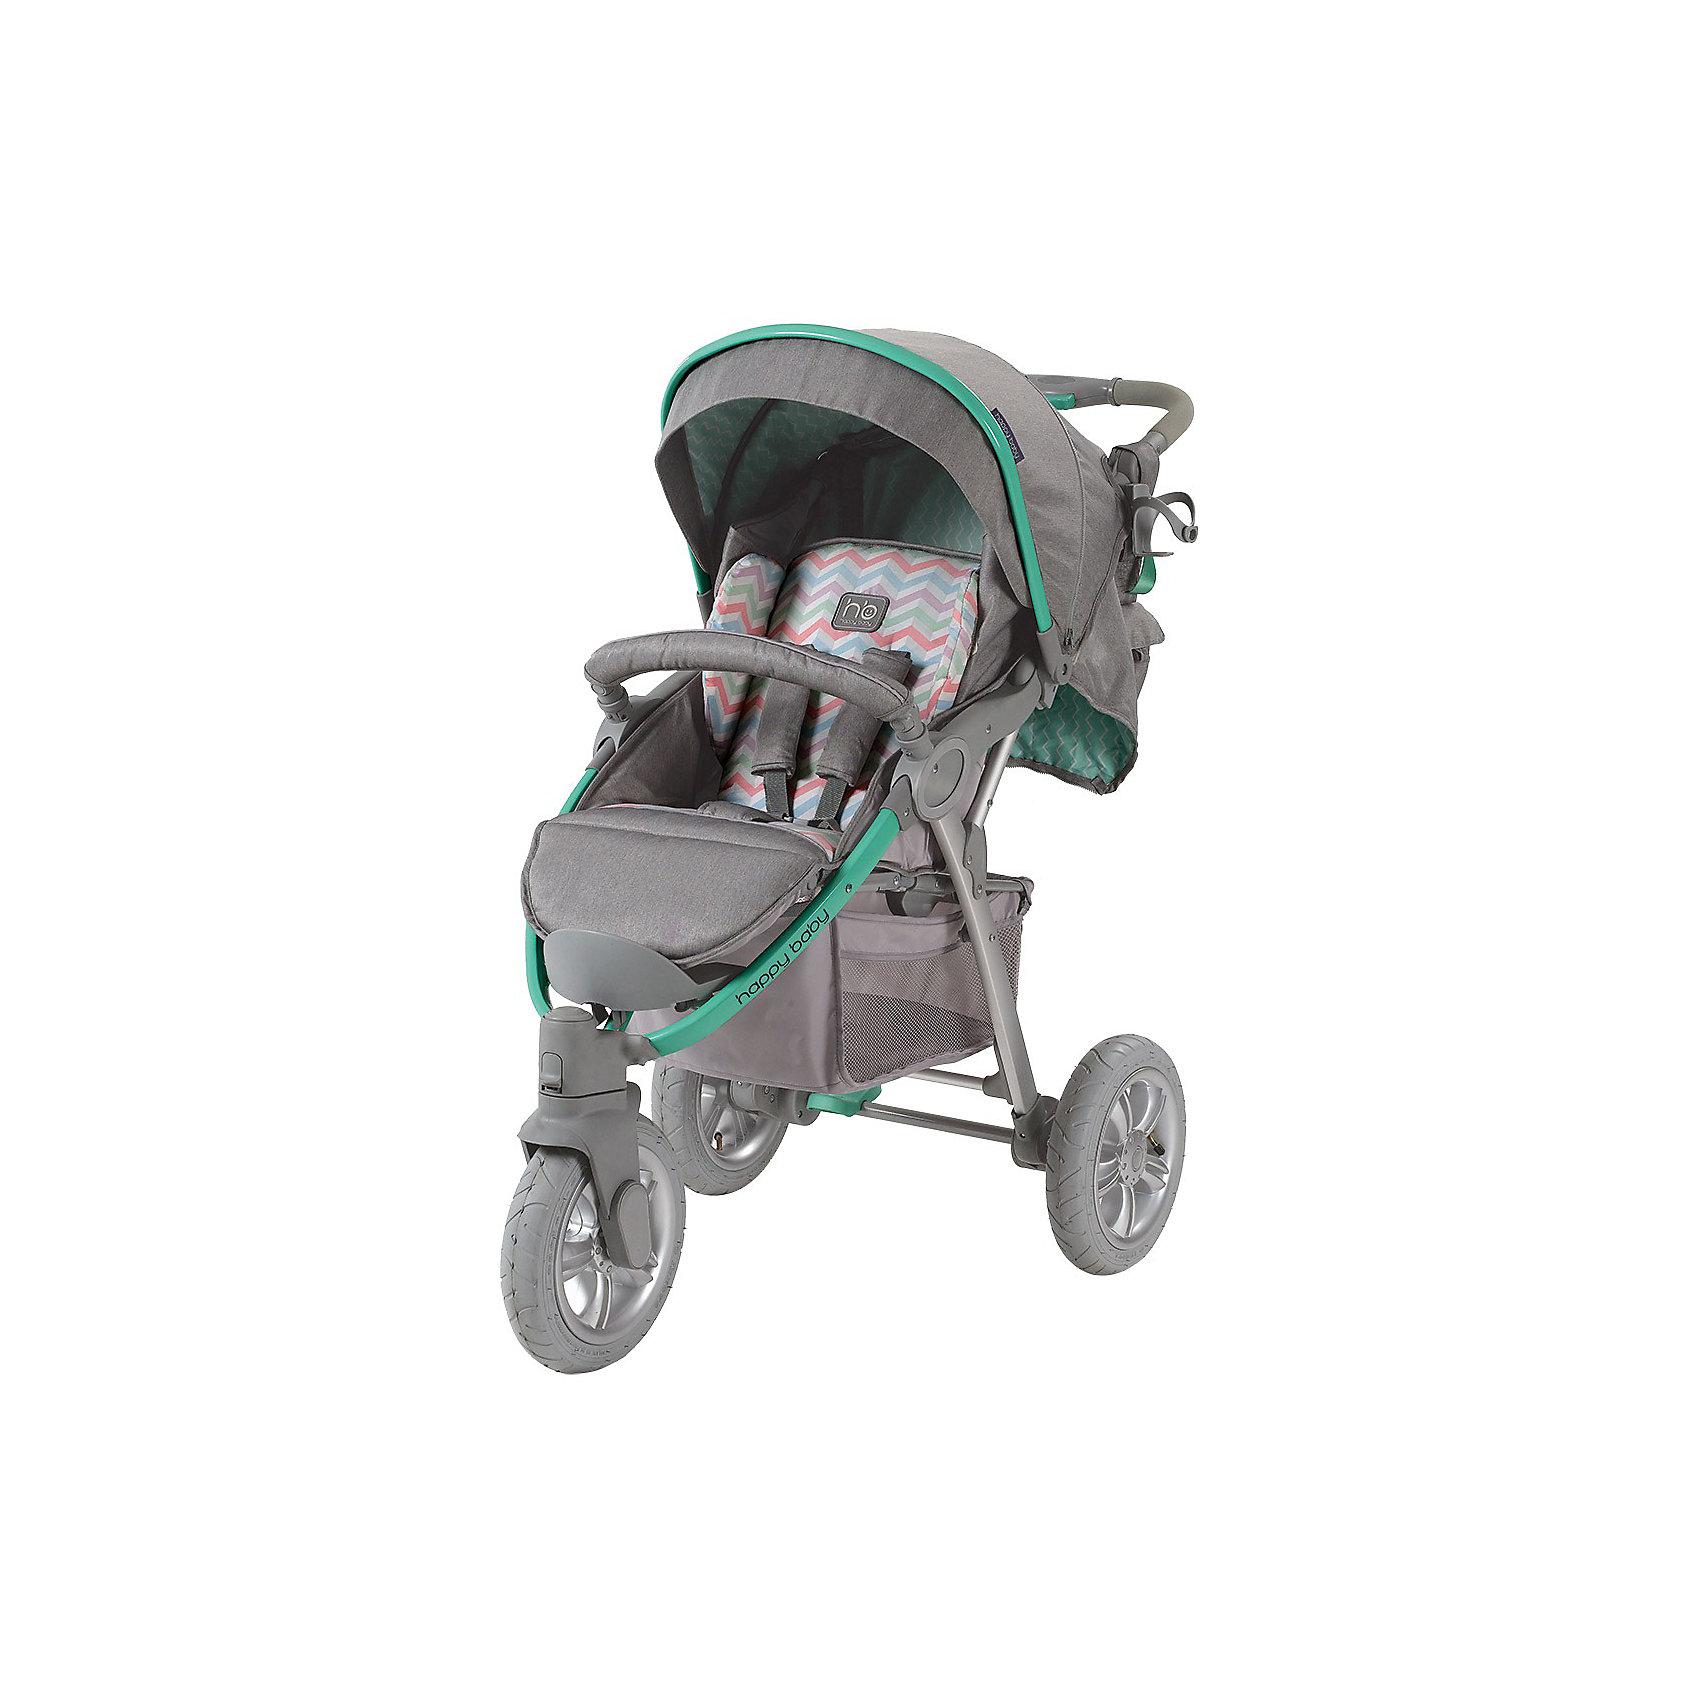 Happy Baby Прогулочная коляска Neon Sport, Happy Baby, серый/ купить б у бампер крыло переднее левое фара левая для киа спектра в спб